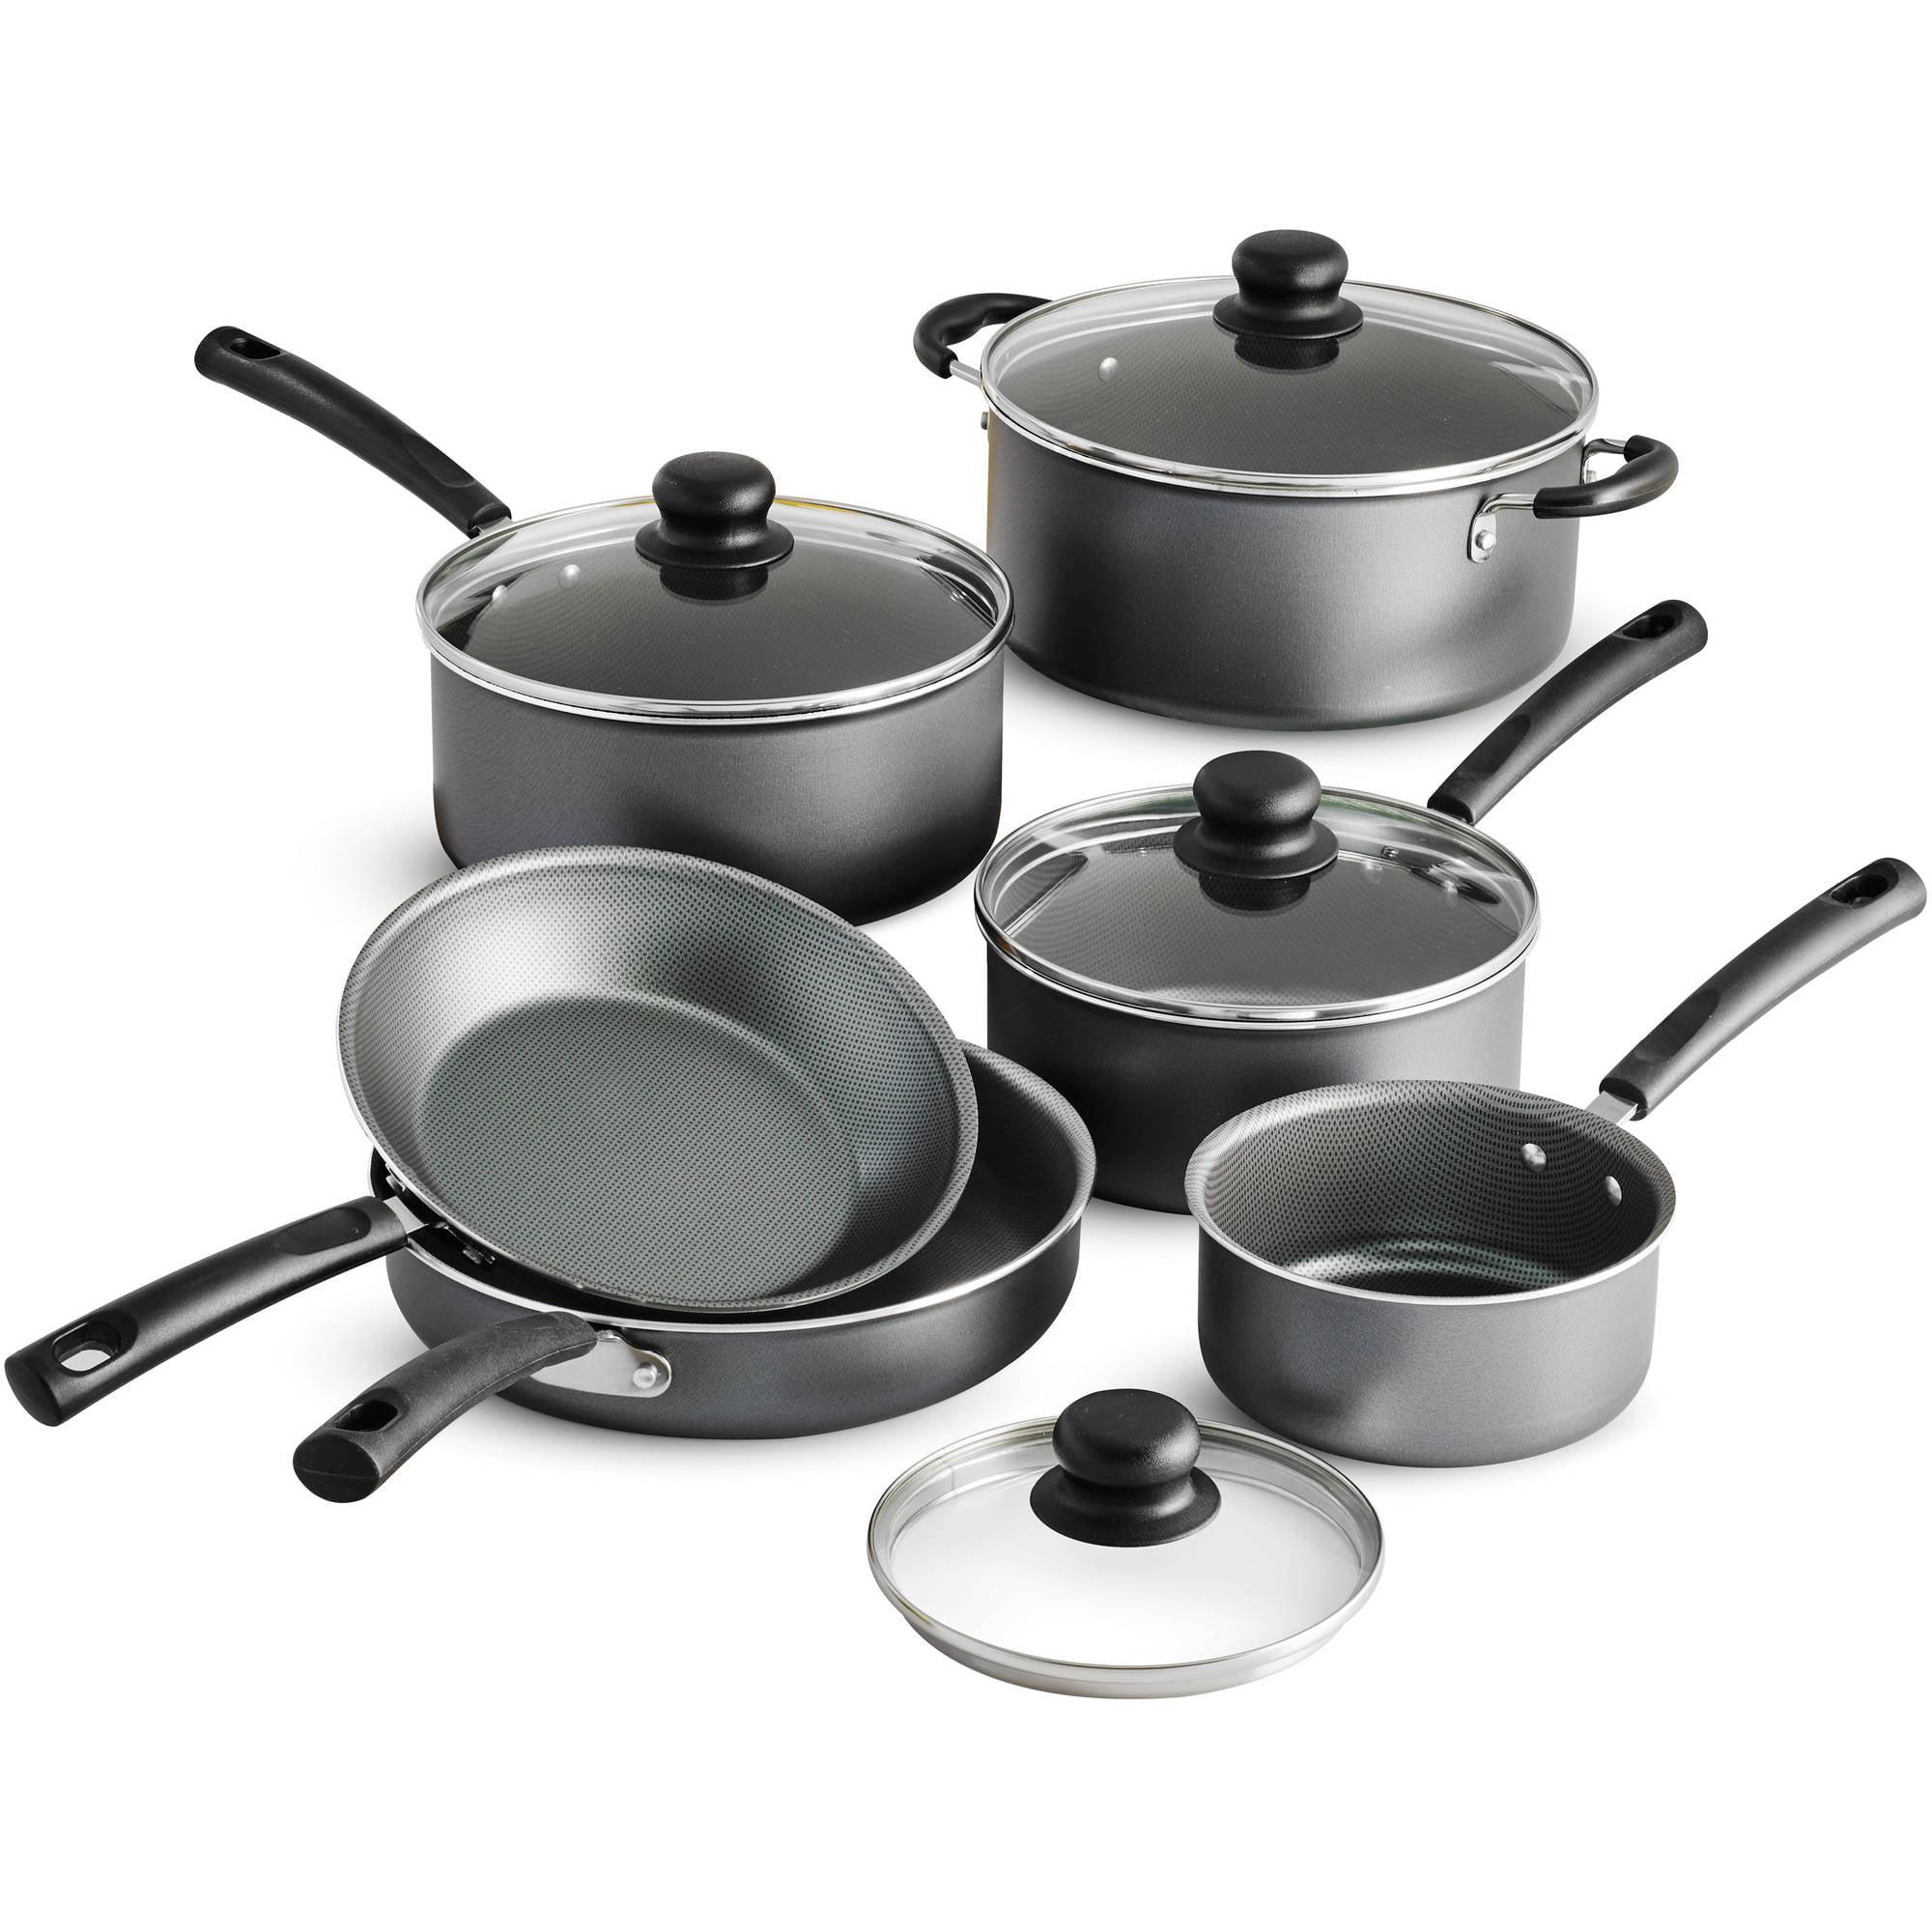 Tramontina PrimaWare 10 Piece Nonstick Cookware Set